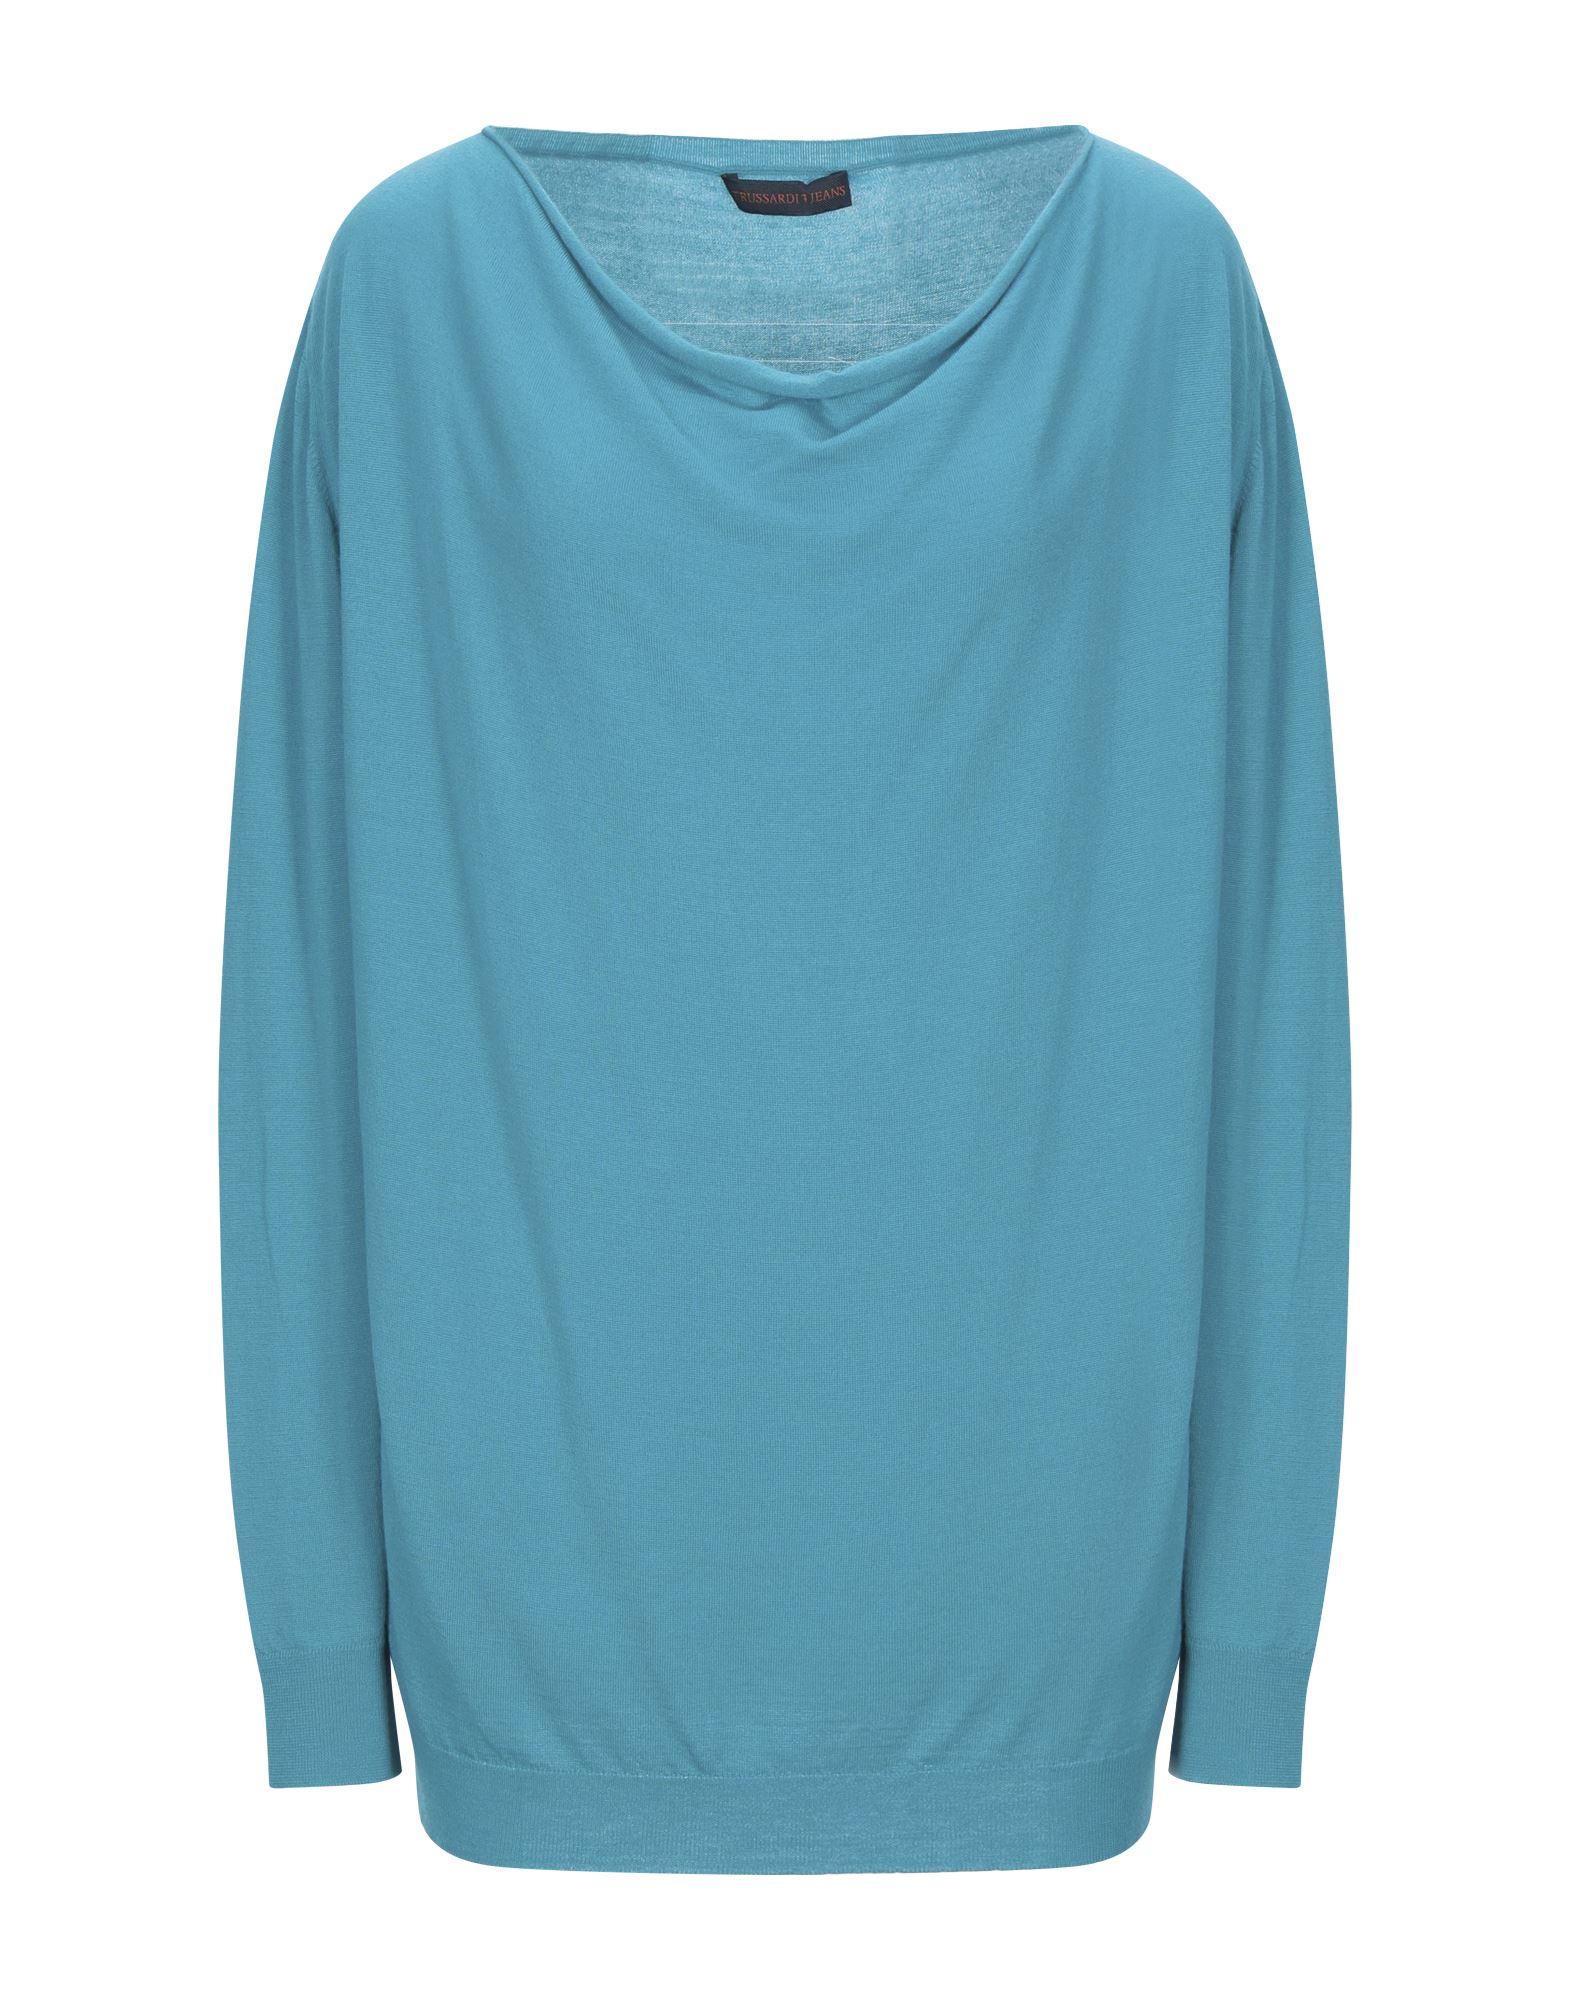 TRUSSARDI JEANS Sweaters - Item 14049855